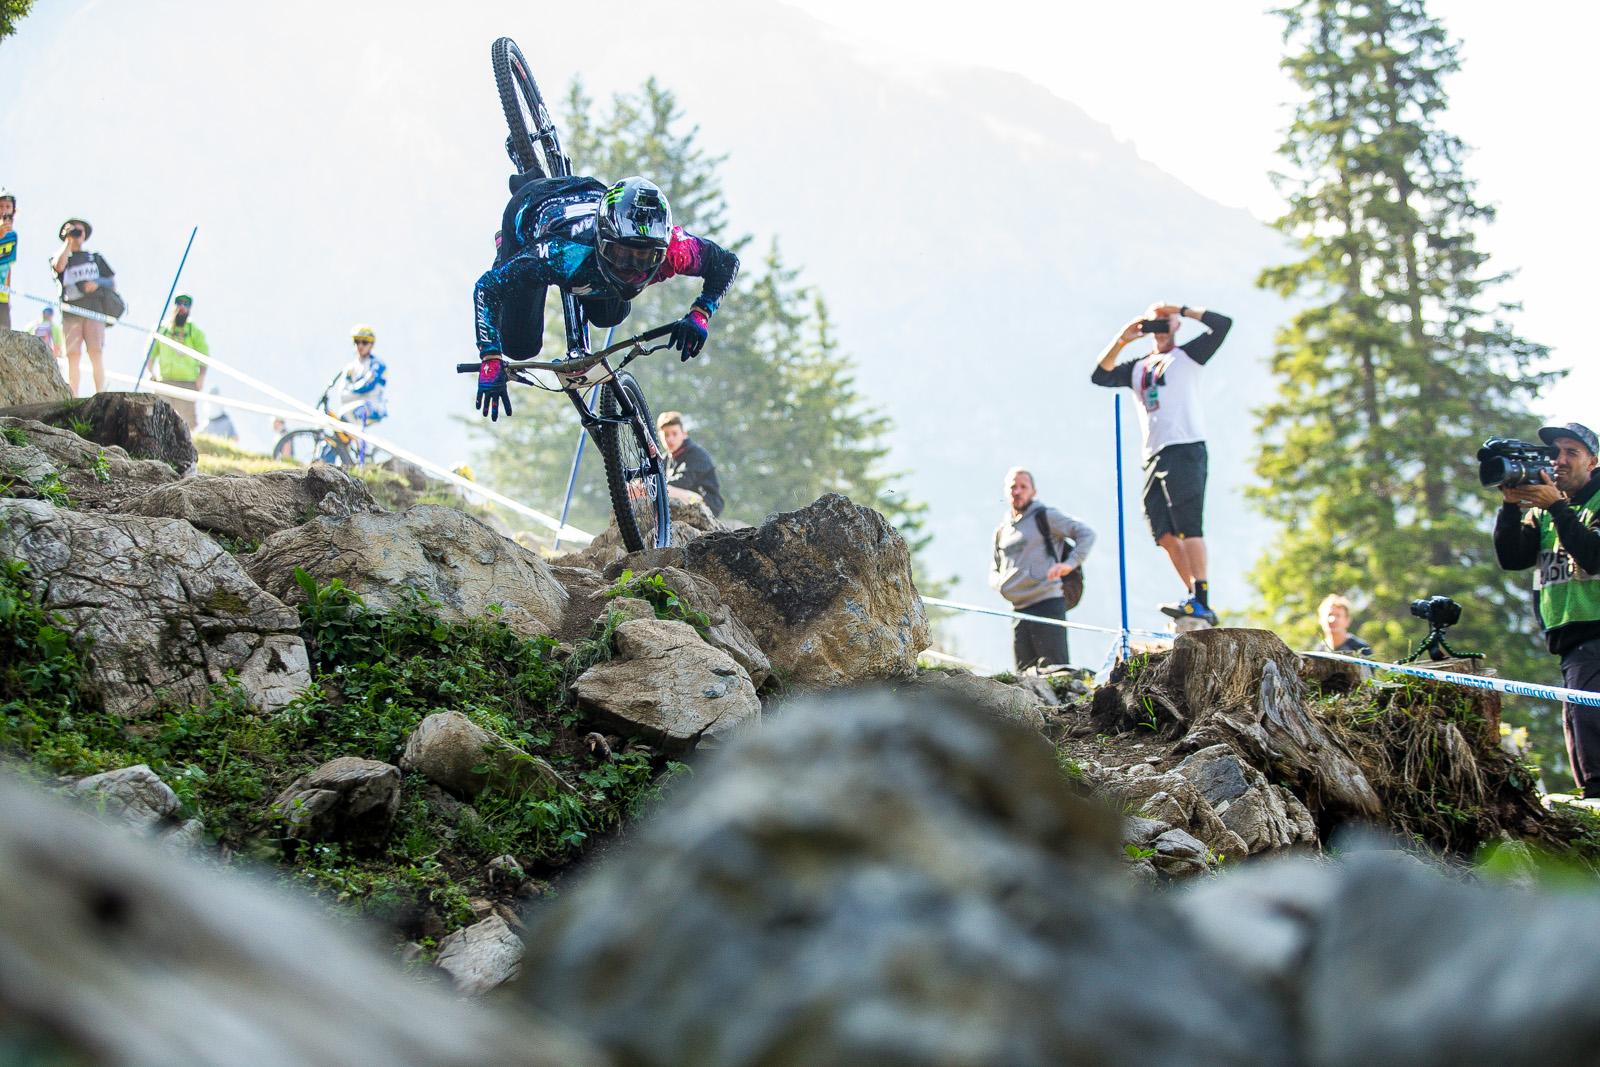 Troy Brosnan's OTB Crash in the Rocks at Lenzerheide